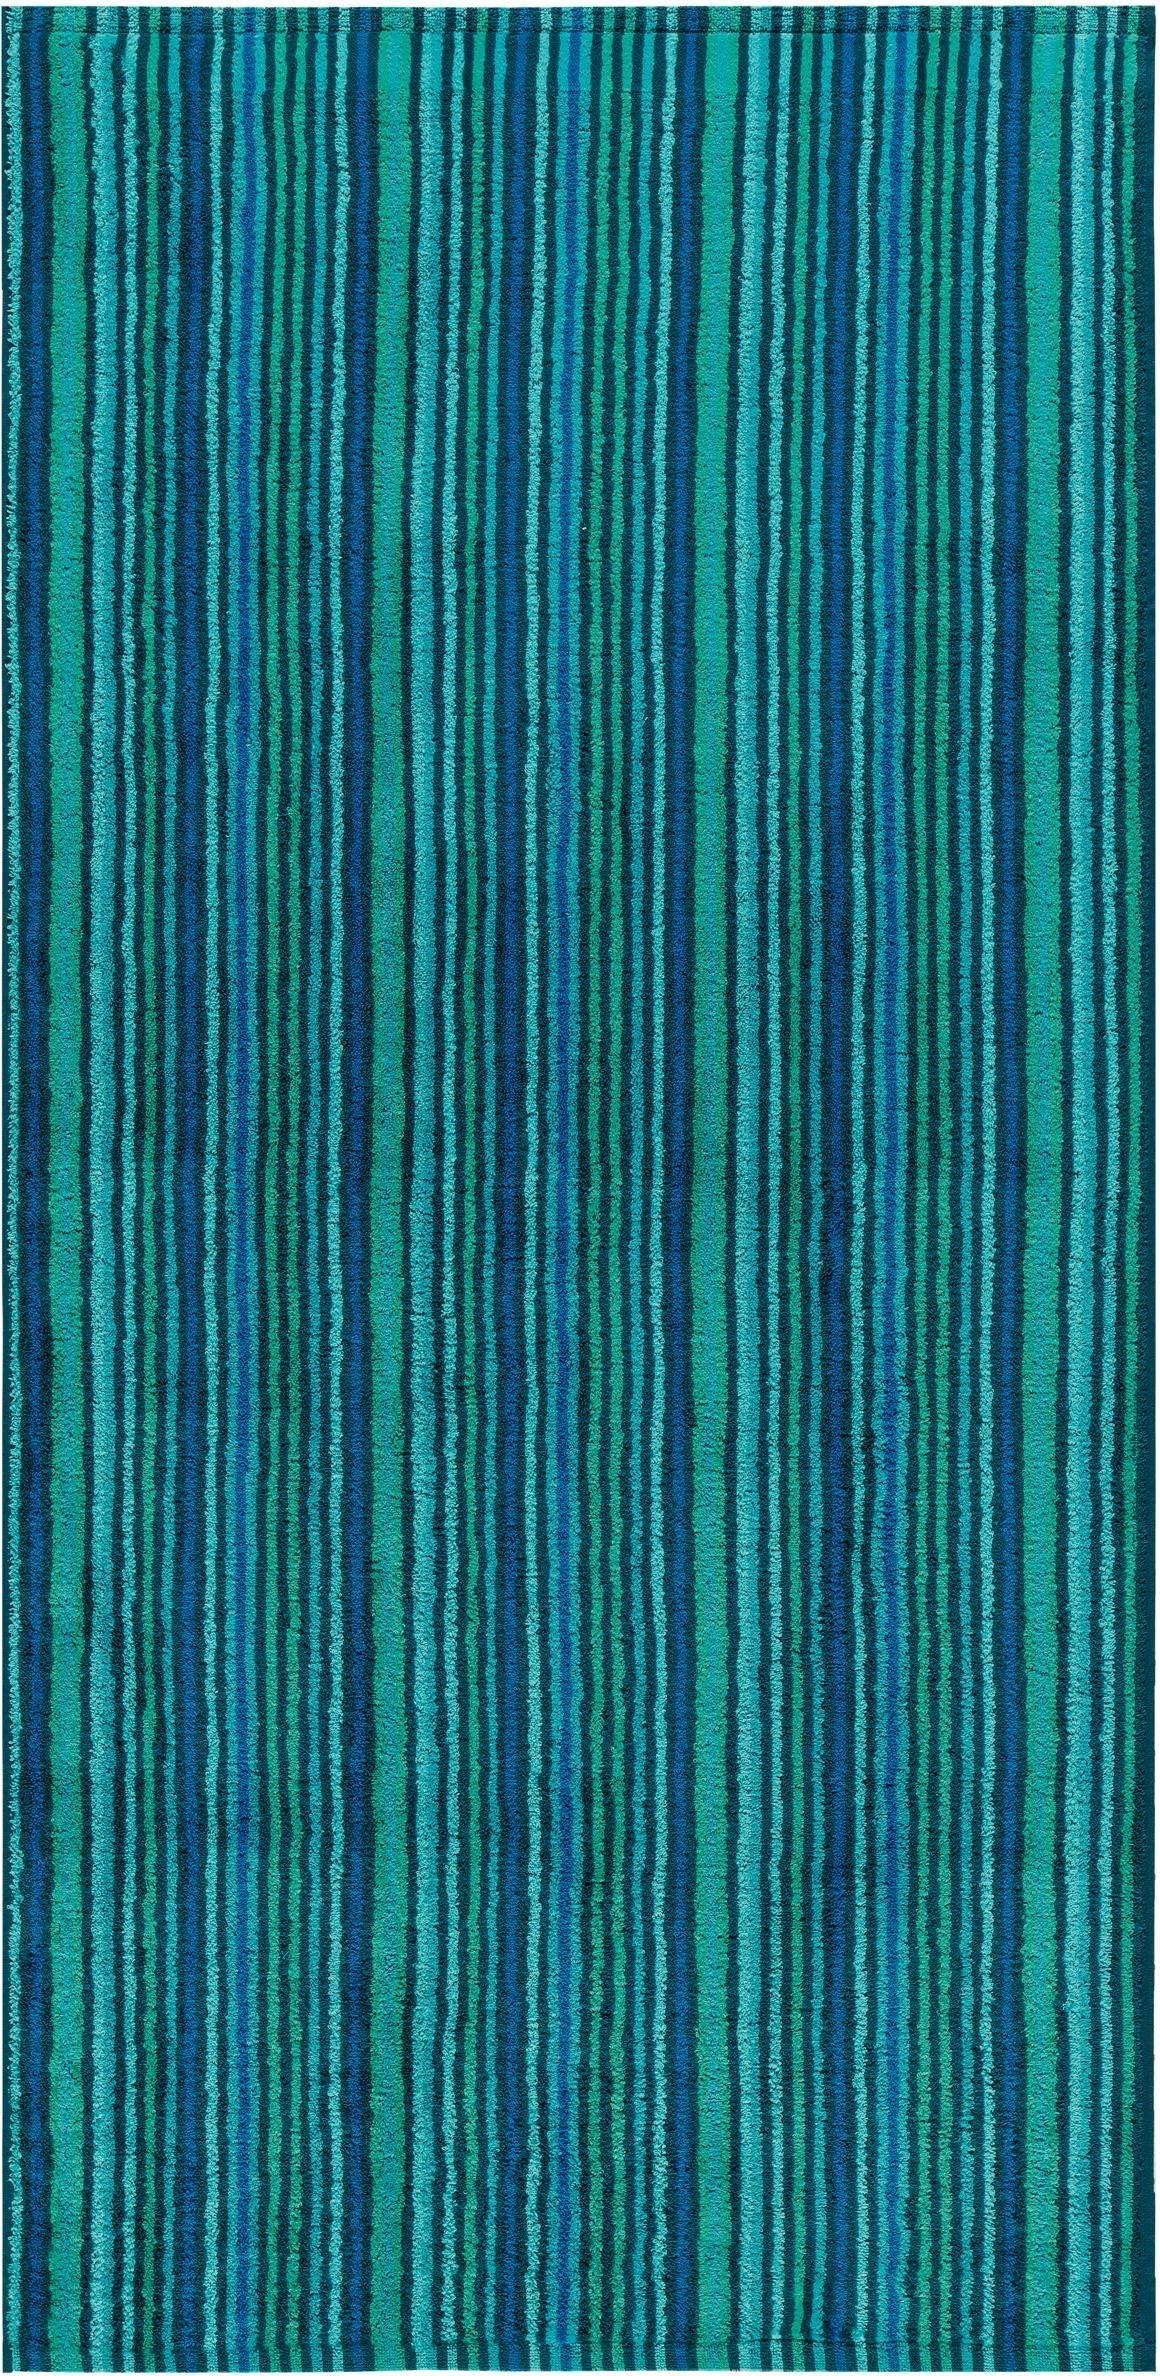 Badetuch, Egeria, »Combi Stripes«, mit feinen Streifen | Bad > Handtücher > Badetücher | Egeria